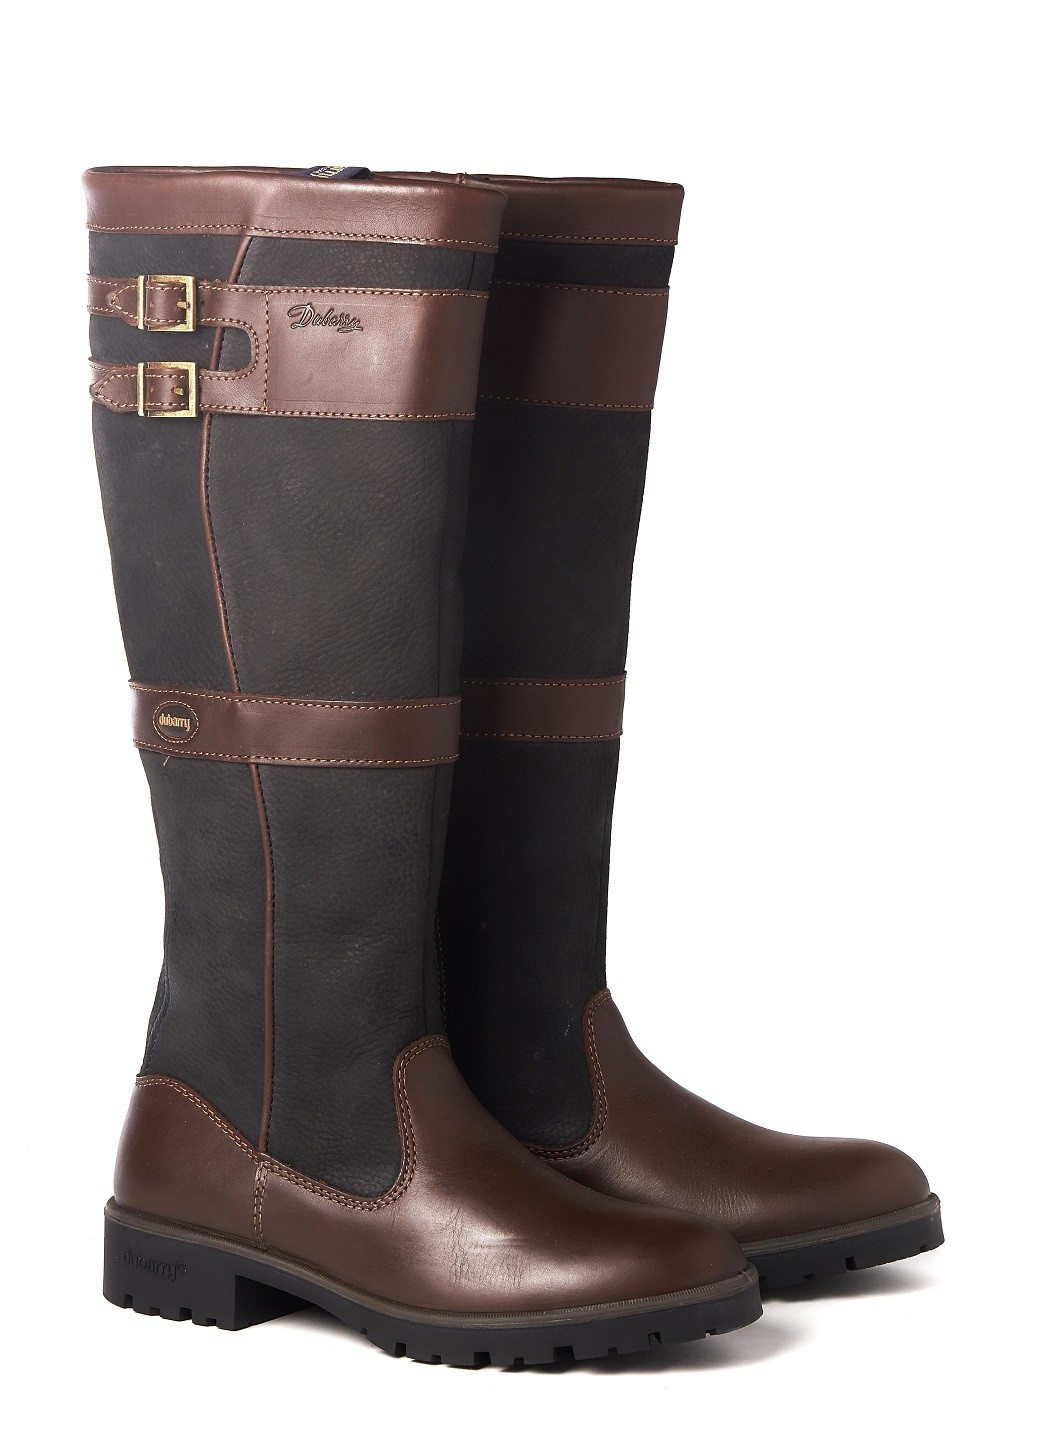 Dubarry Longford - Black/Brown-1